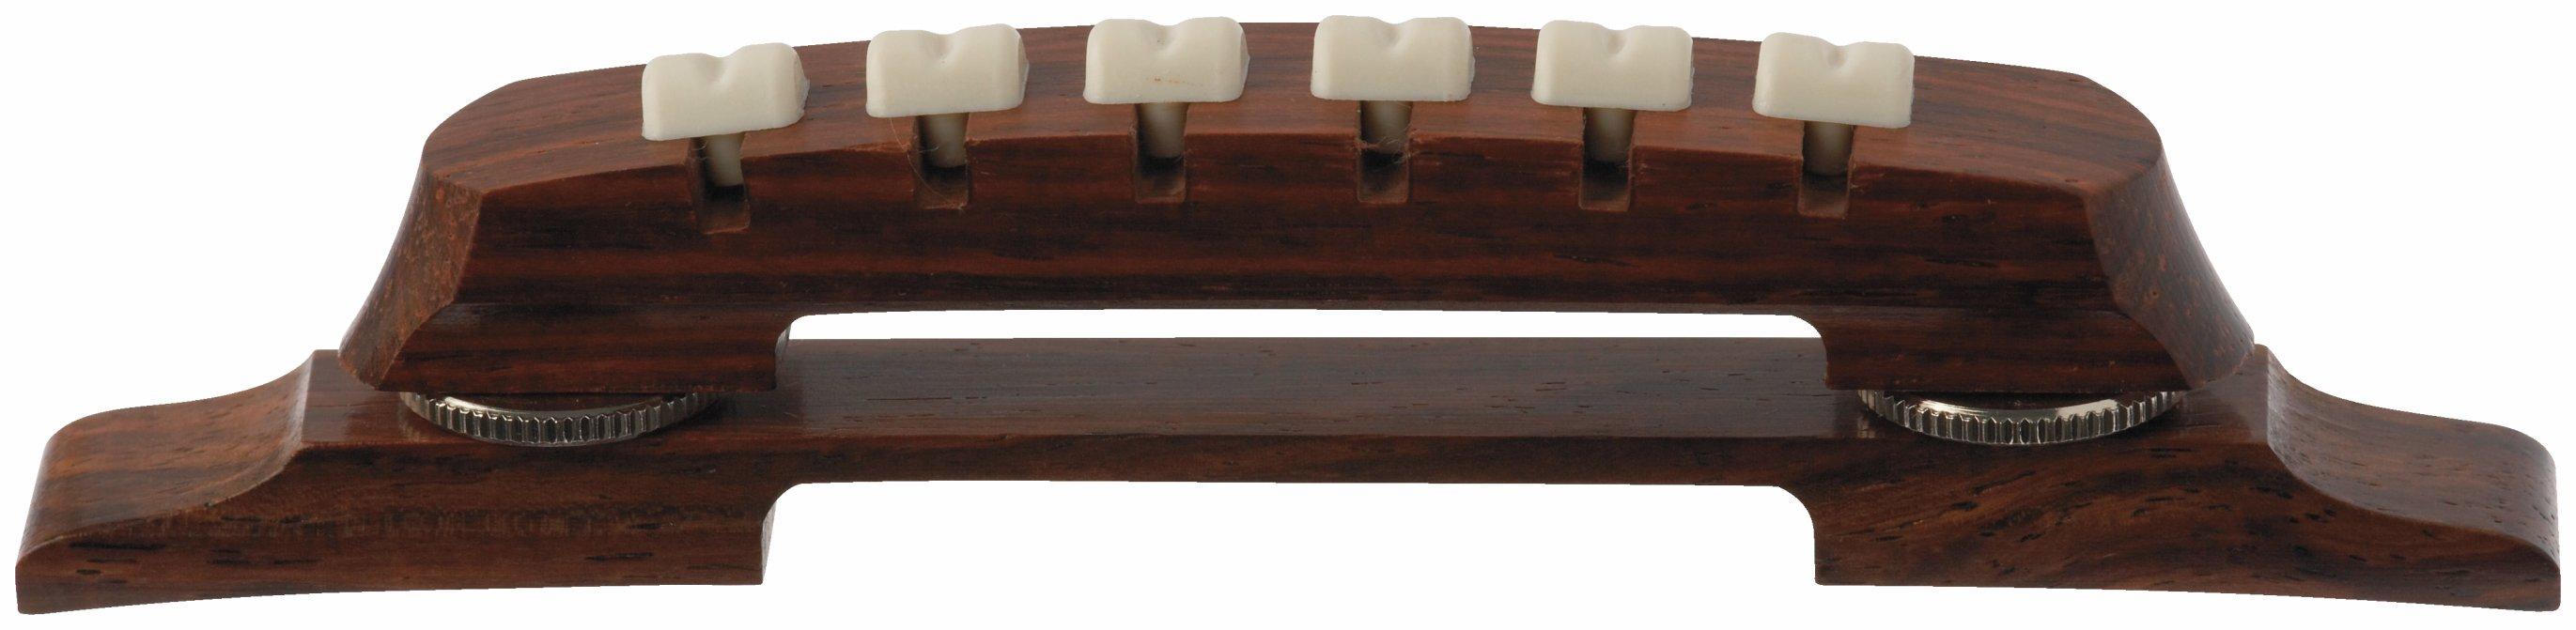 Framus Vintage Parts - Adjustable Archtop Bridge, Rosewood, 6-String